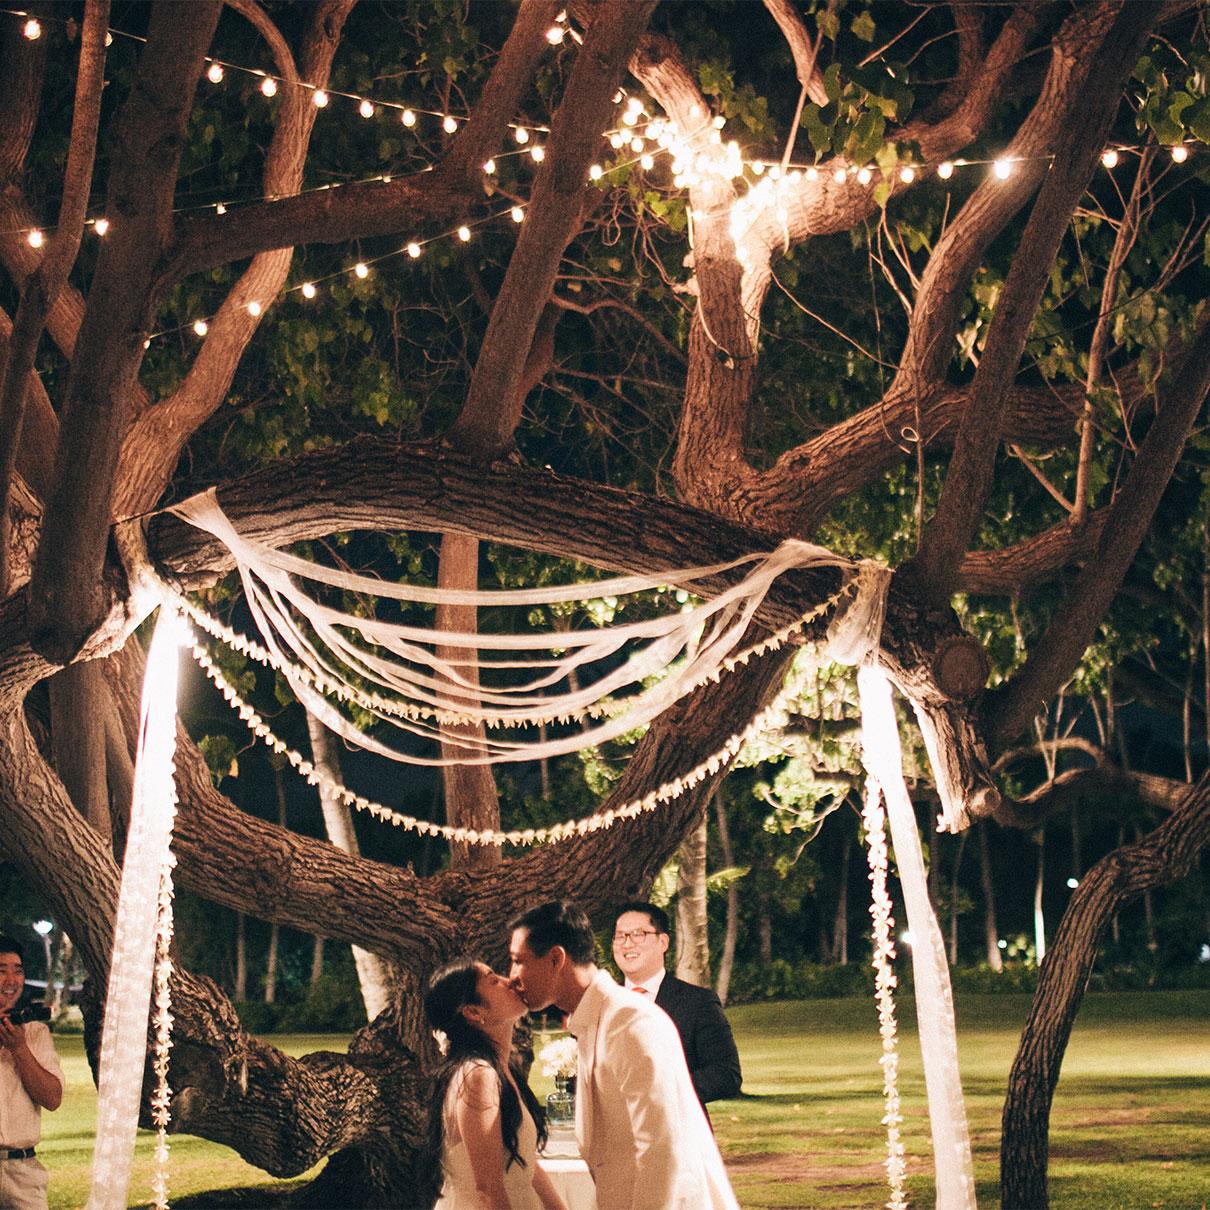 Hawaii destination wedding nighttime ceremony mango muse events bride and groom at a nighttime ceremony for a hawaii destination wedding by destination wedding planner junglespirit Choice Image